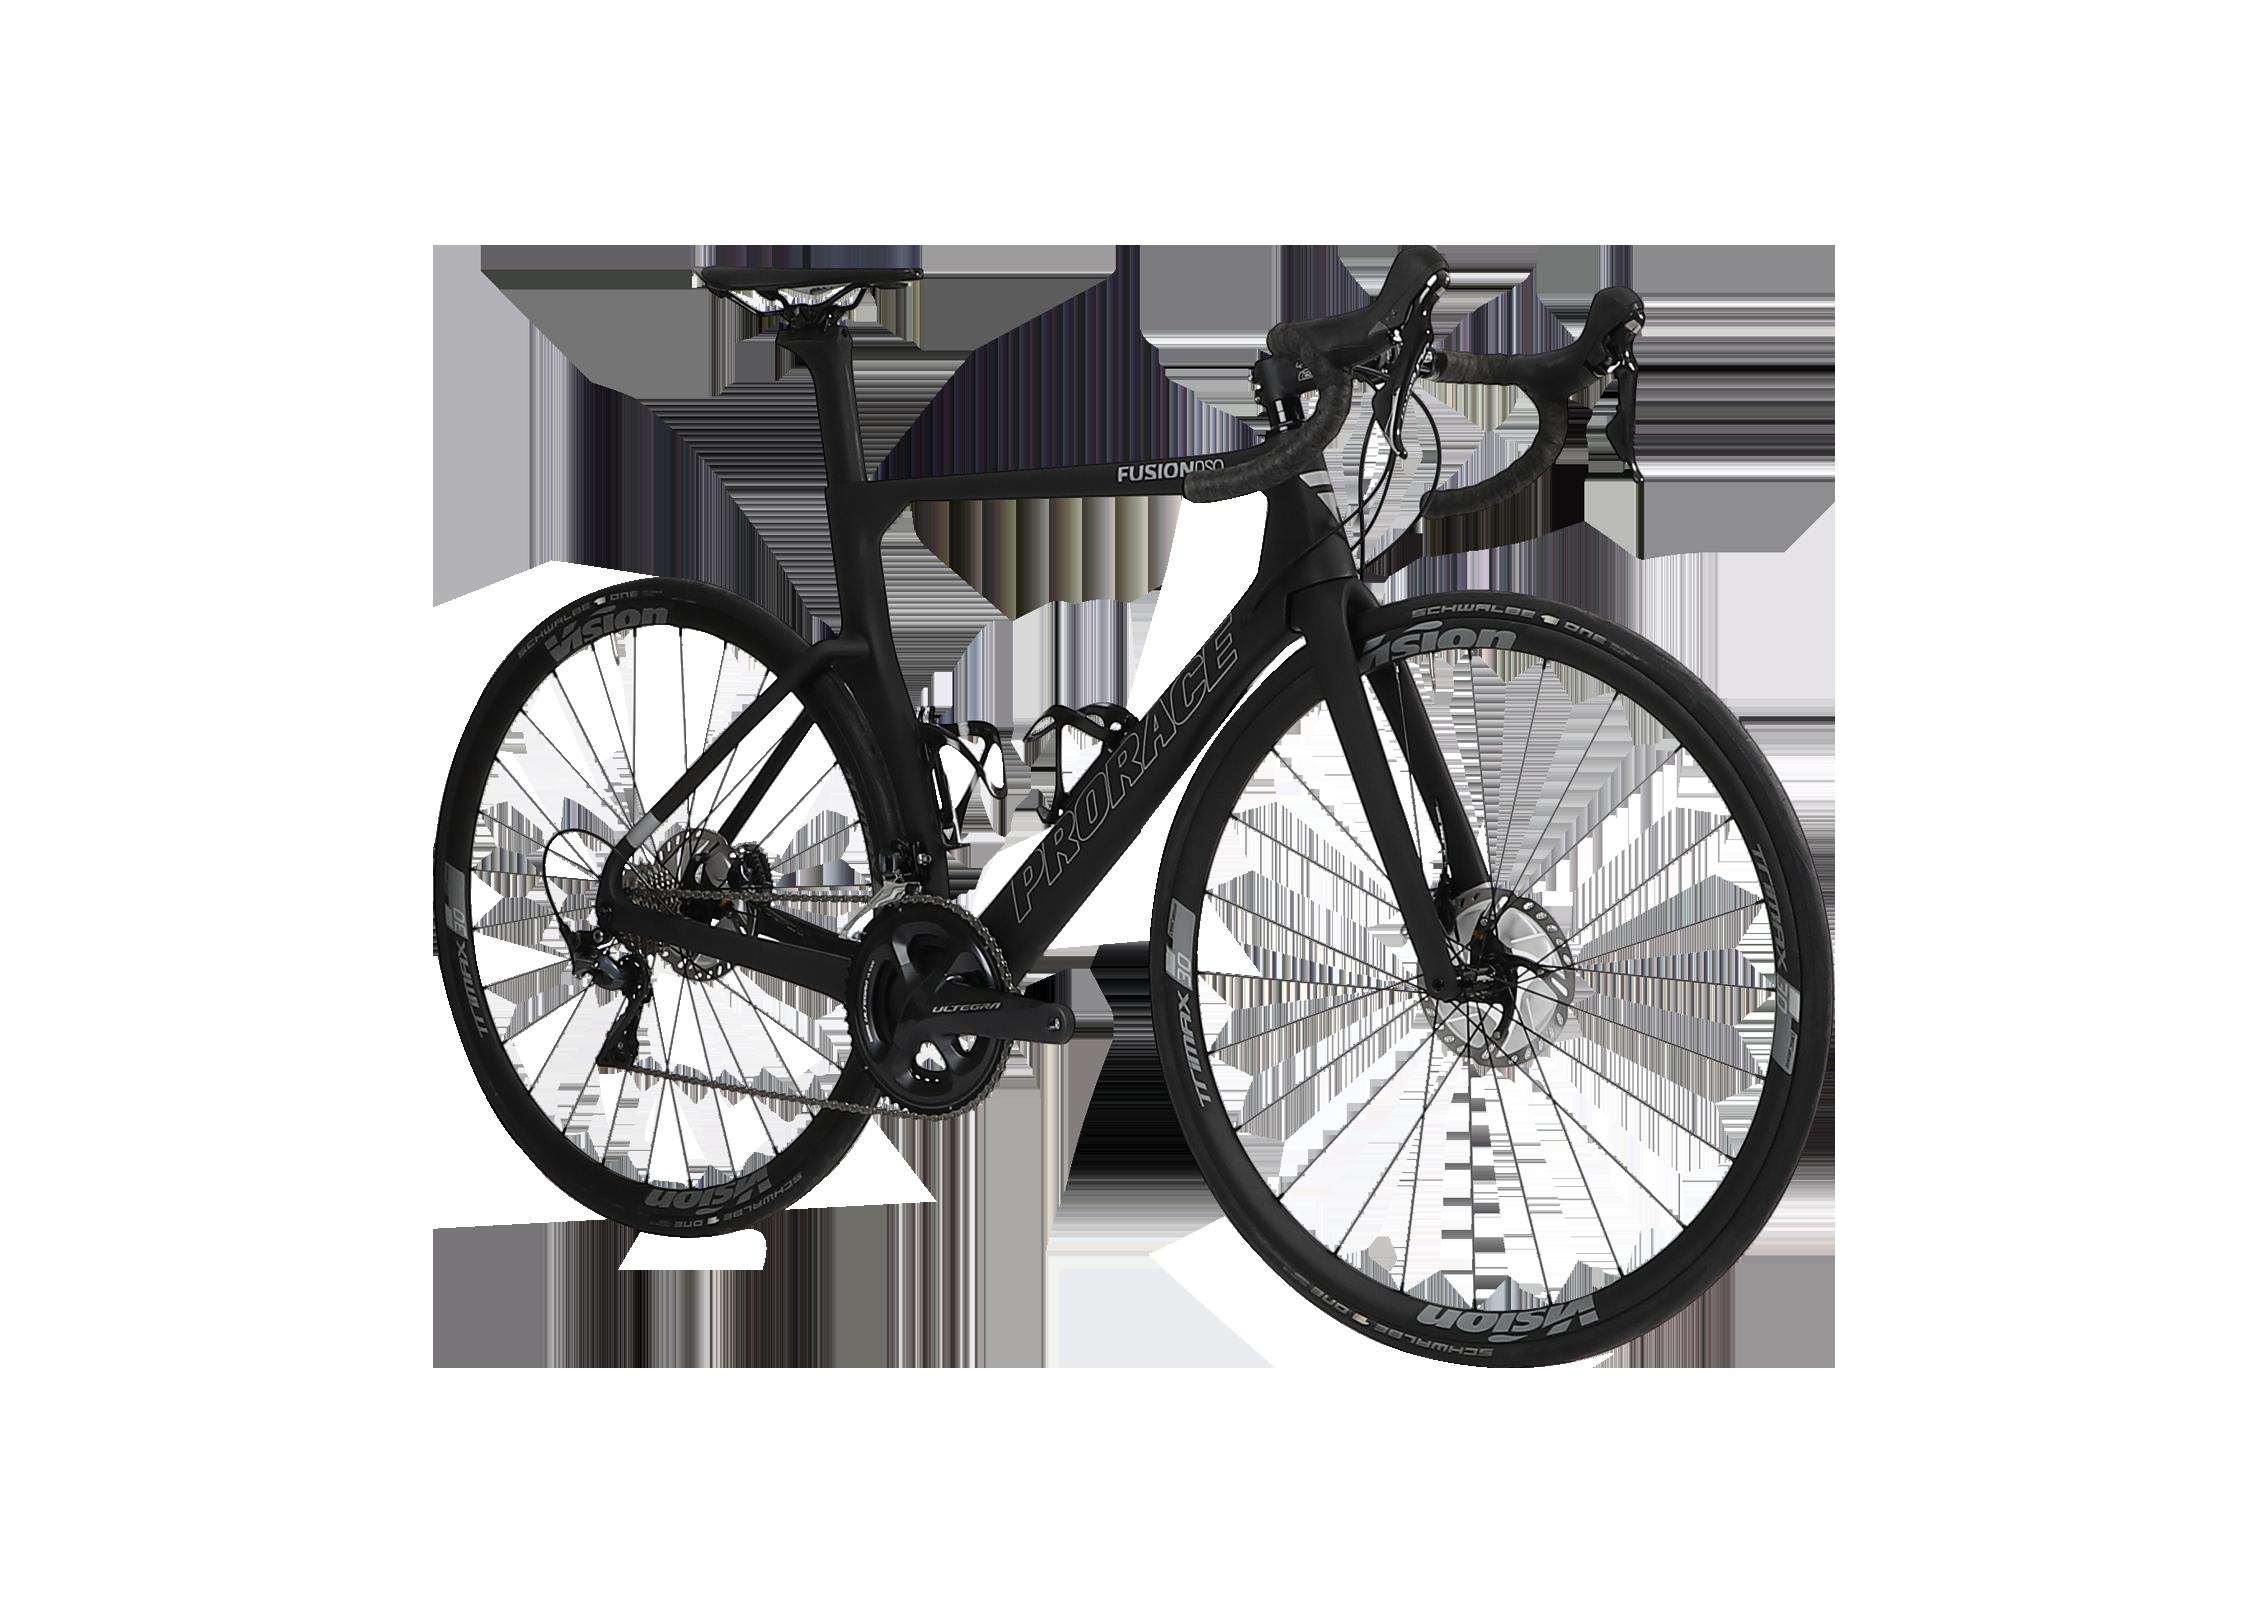 Fusion DSQ aerodynamische fiets Prorace vooraanzicht